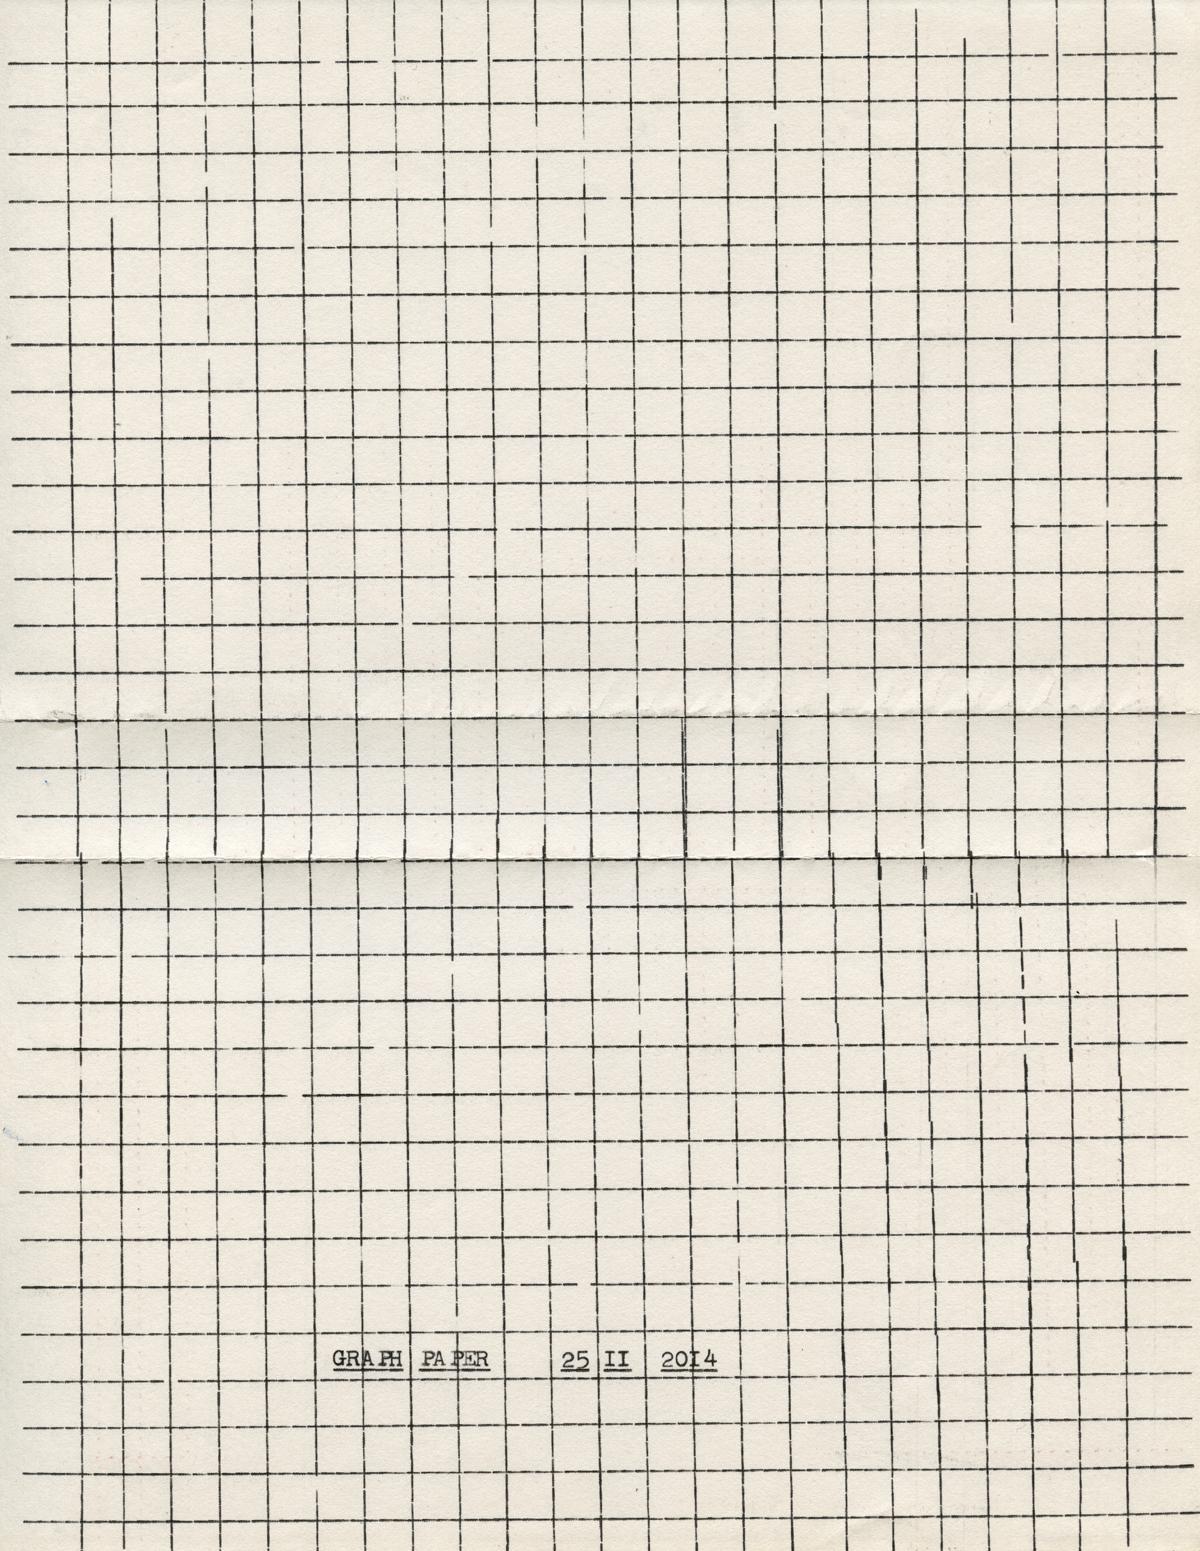 tw_25_11_2014_graph_paper.jpg